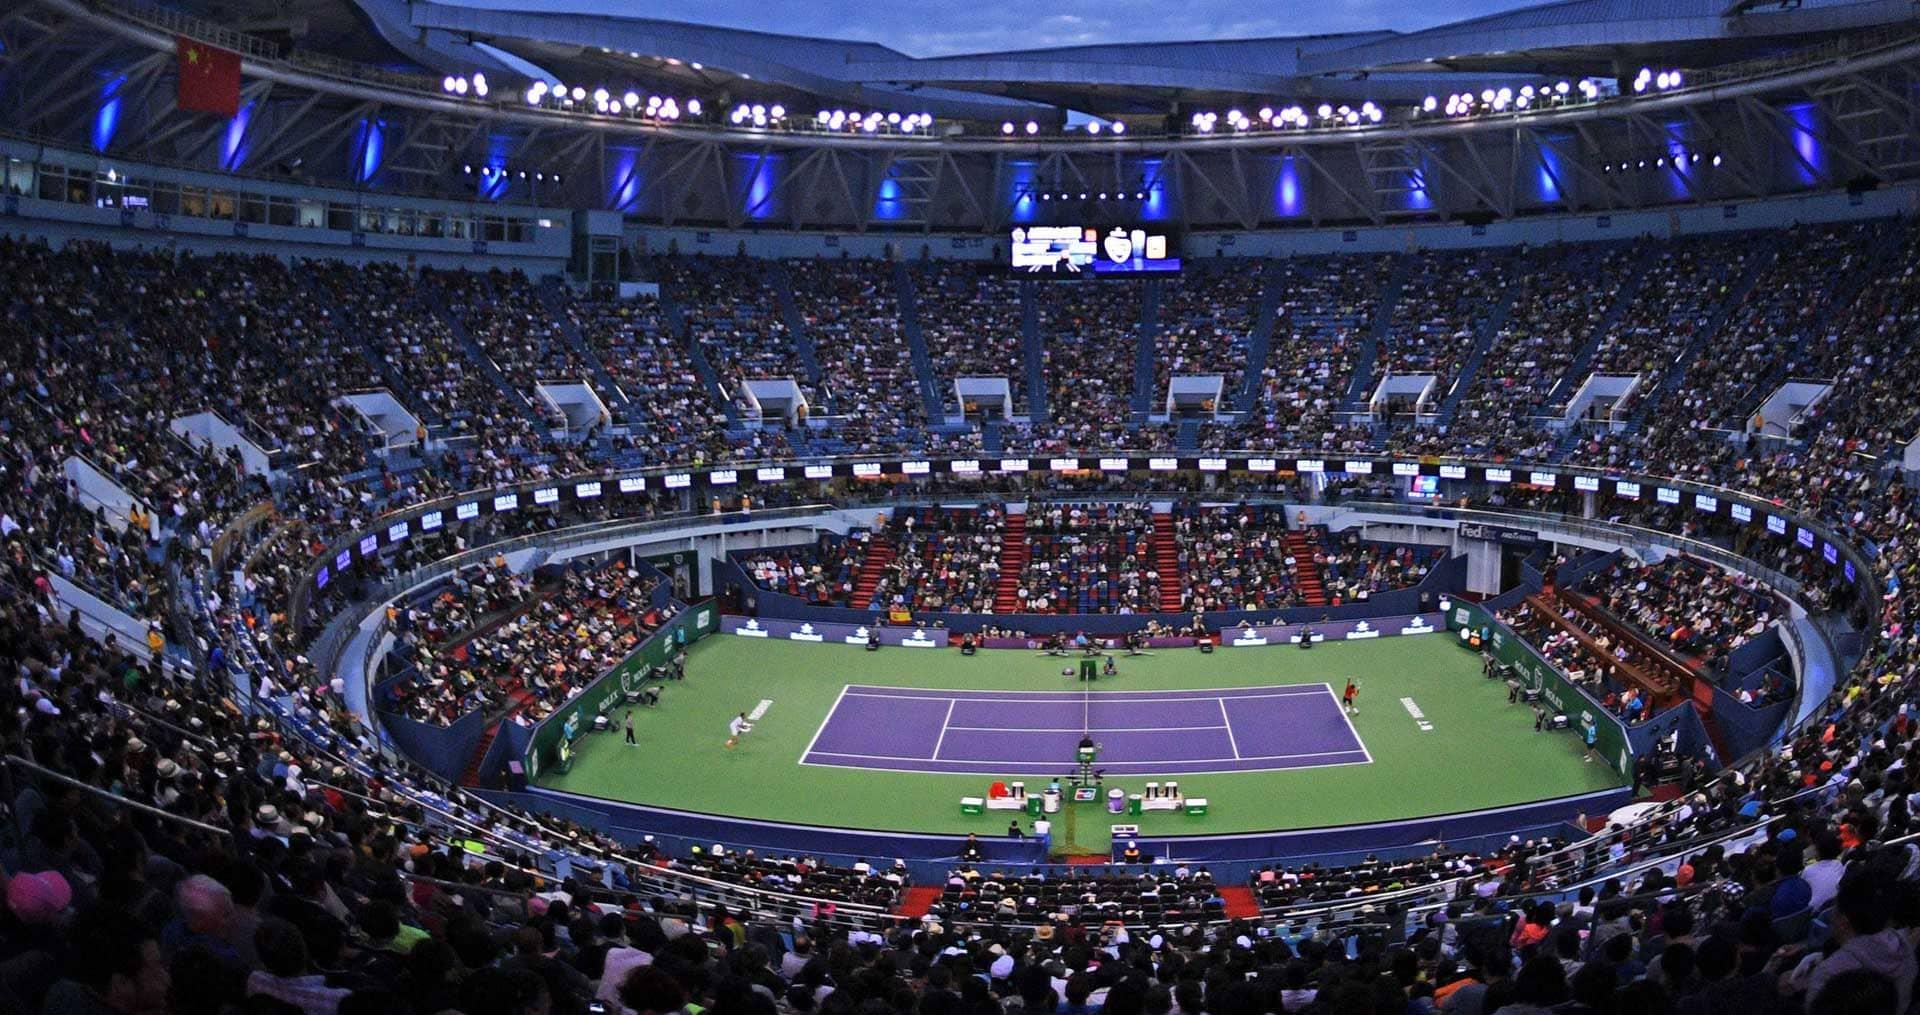 Atp World Tour Masters  Shanghai Overview Atp World Tour Tennis